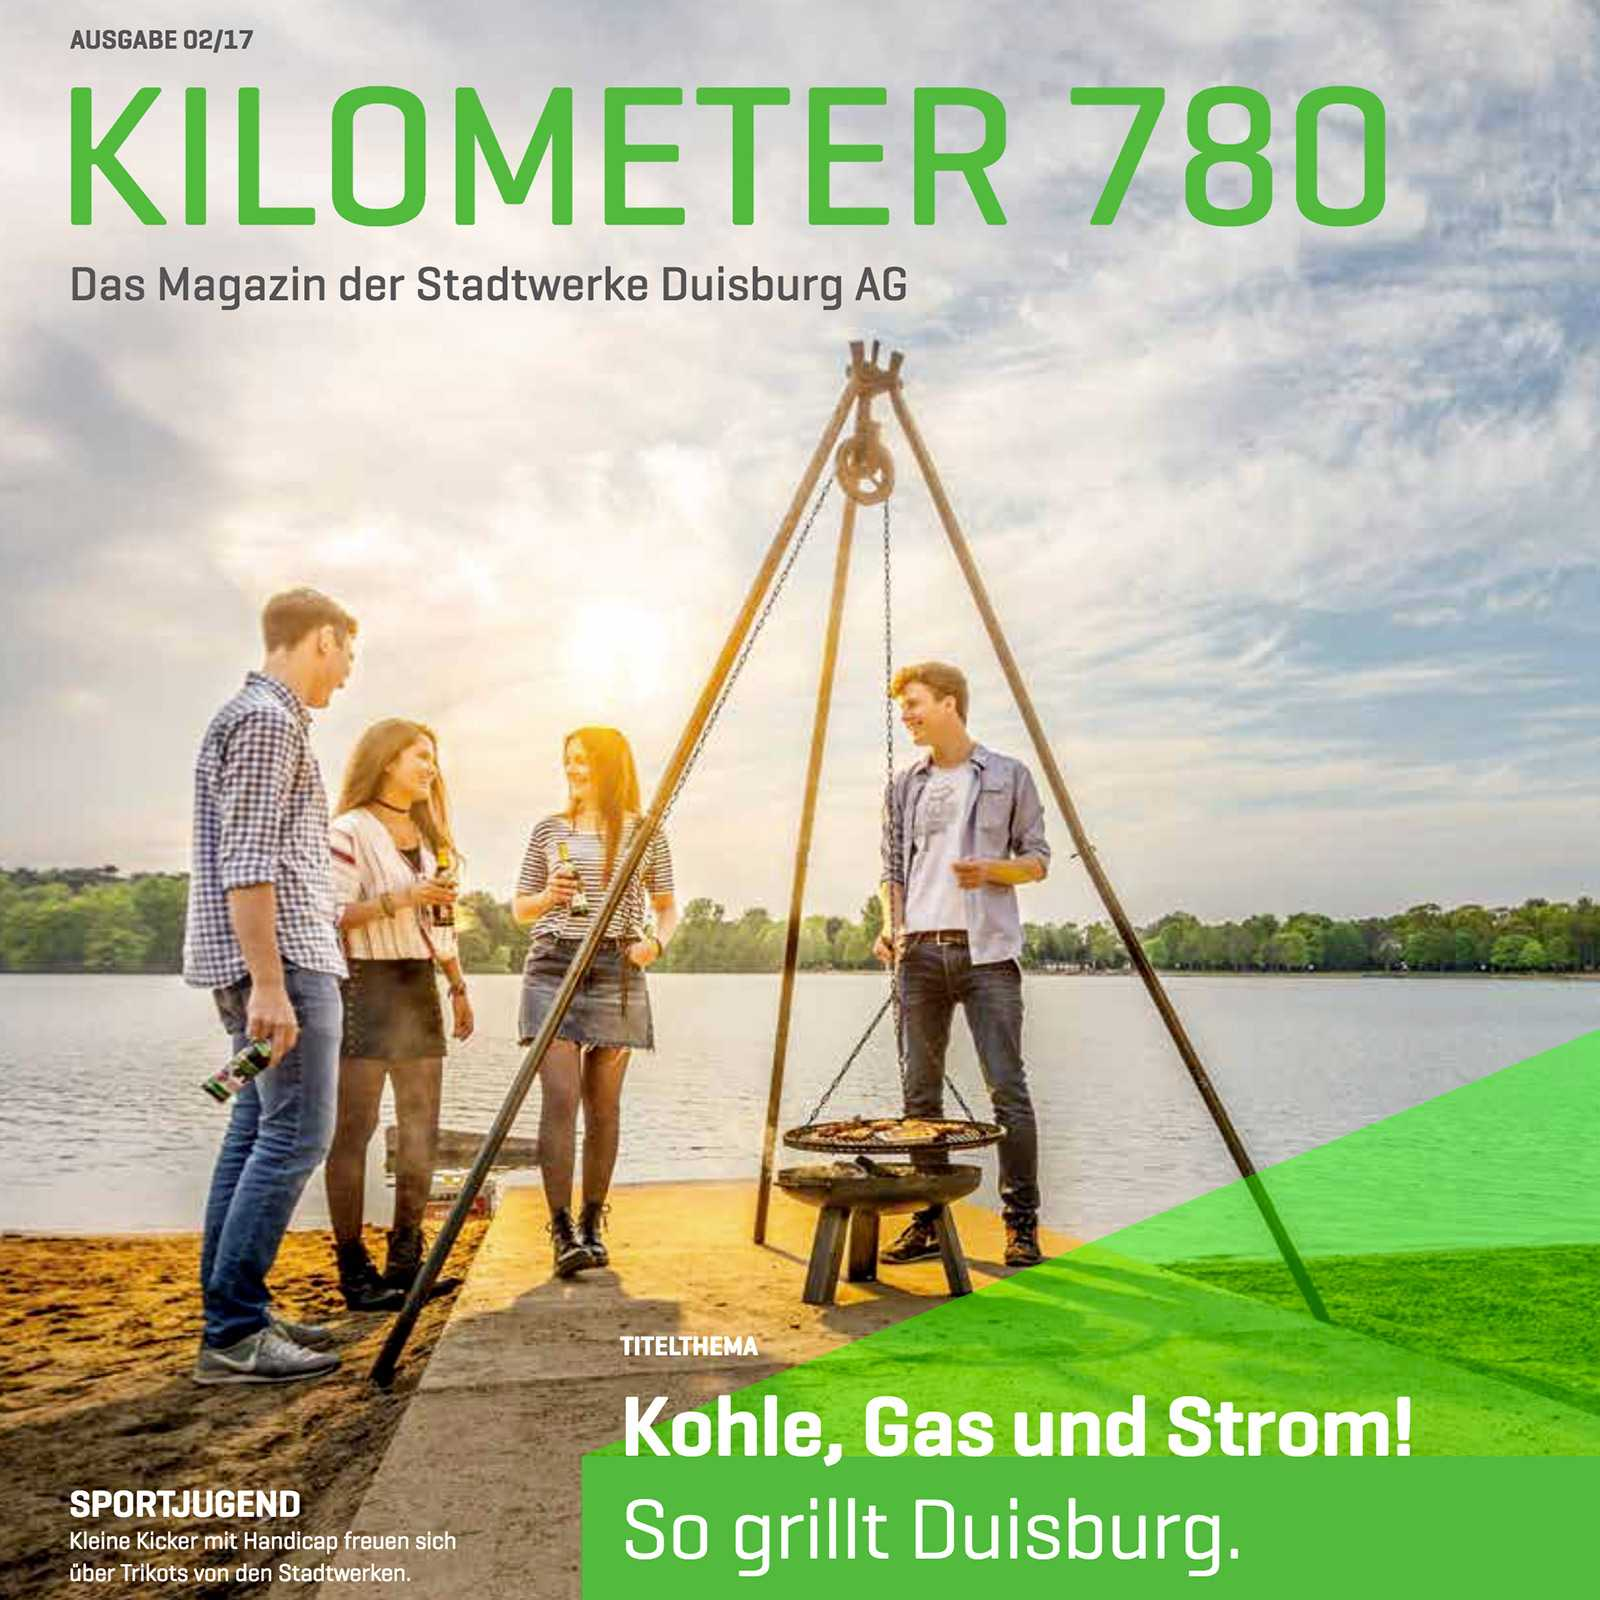 KILOMETER 780